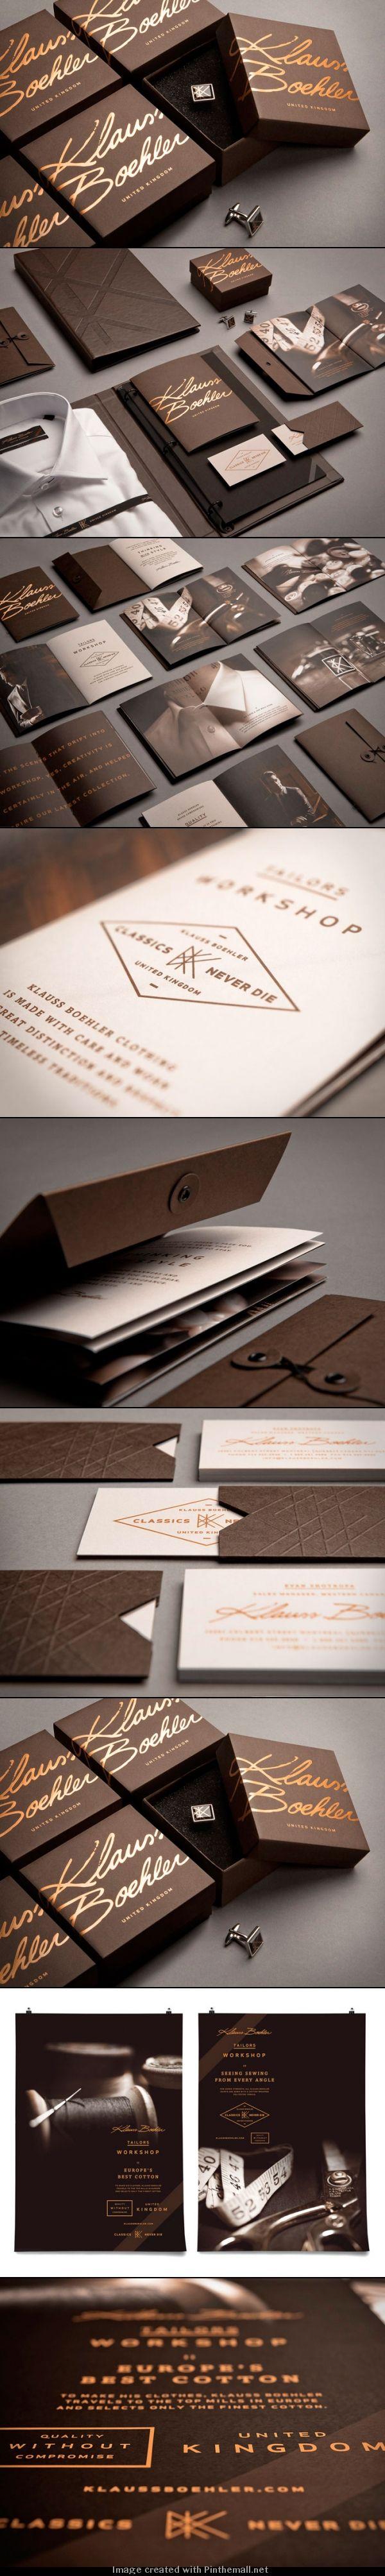 Klauss Boehler Beautiful #identity #packaging #branding PD